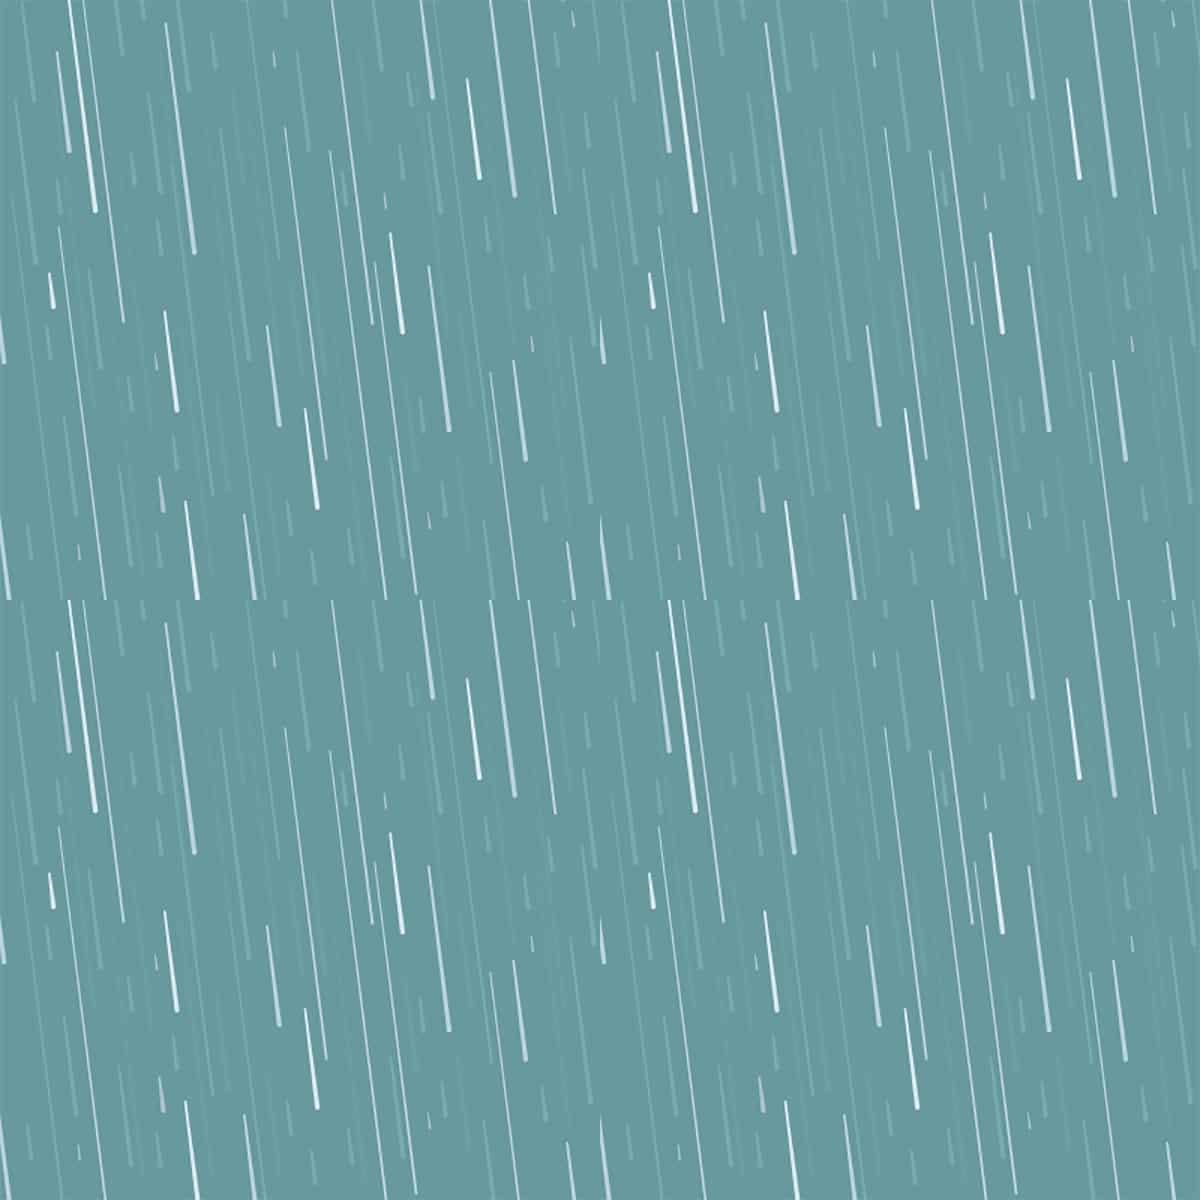 Dream of showering in the rain